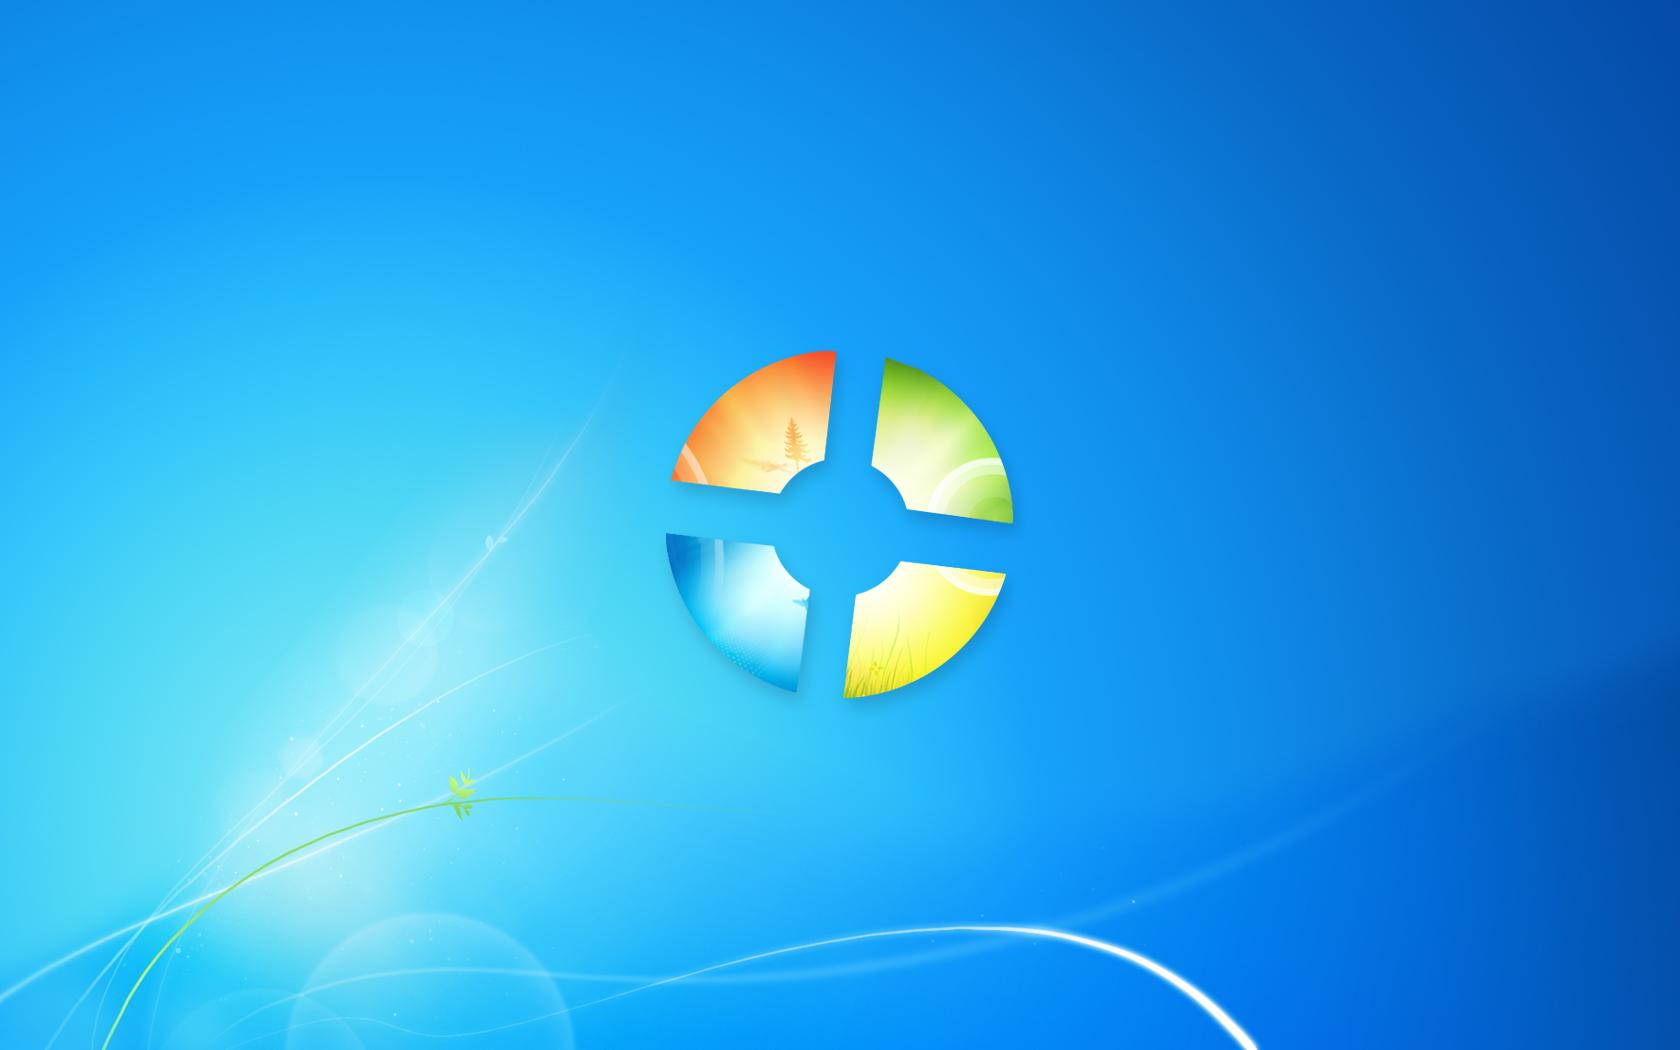 Free Microsoft Desktop Backgrounds